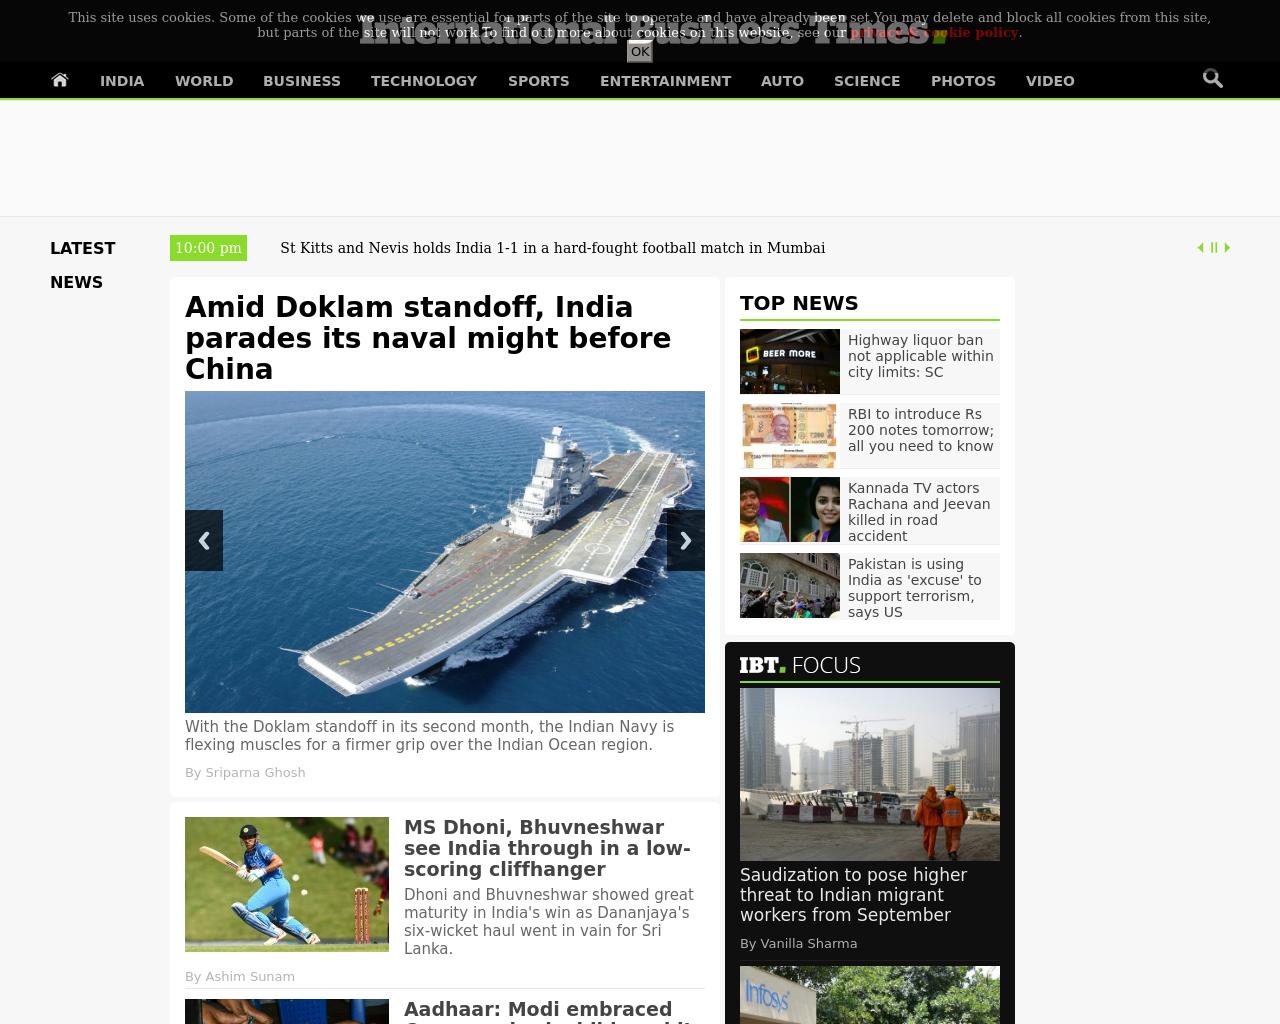 IB-Times-Advertising-Reviews-Pricing